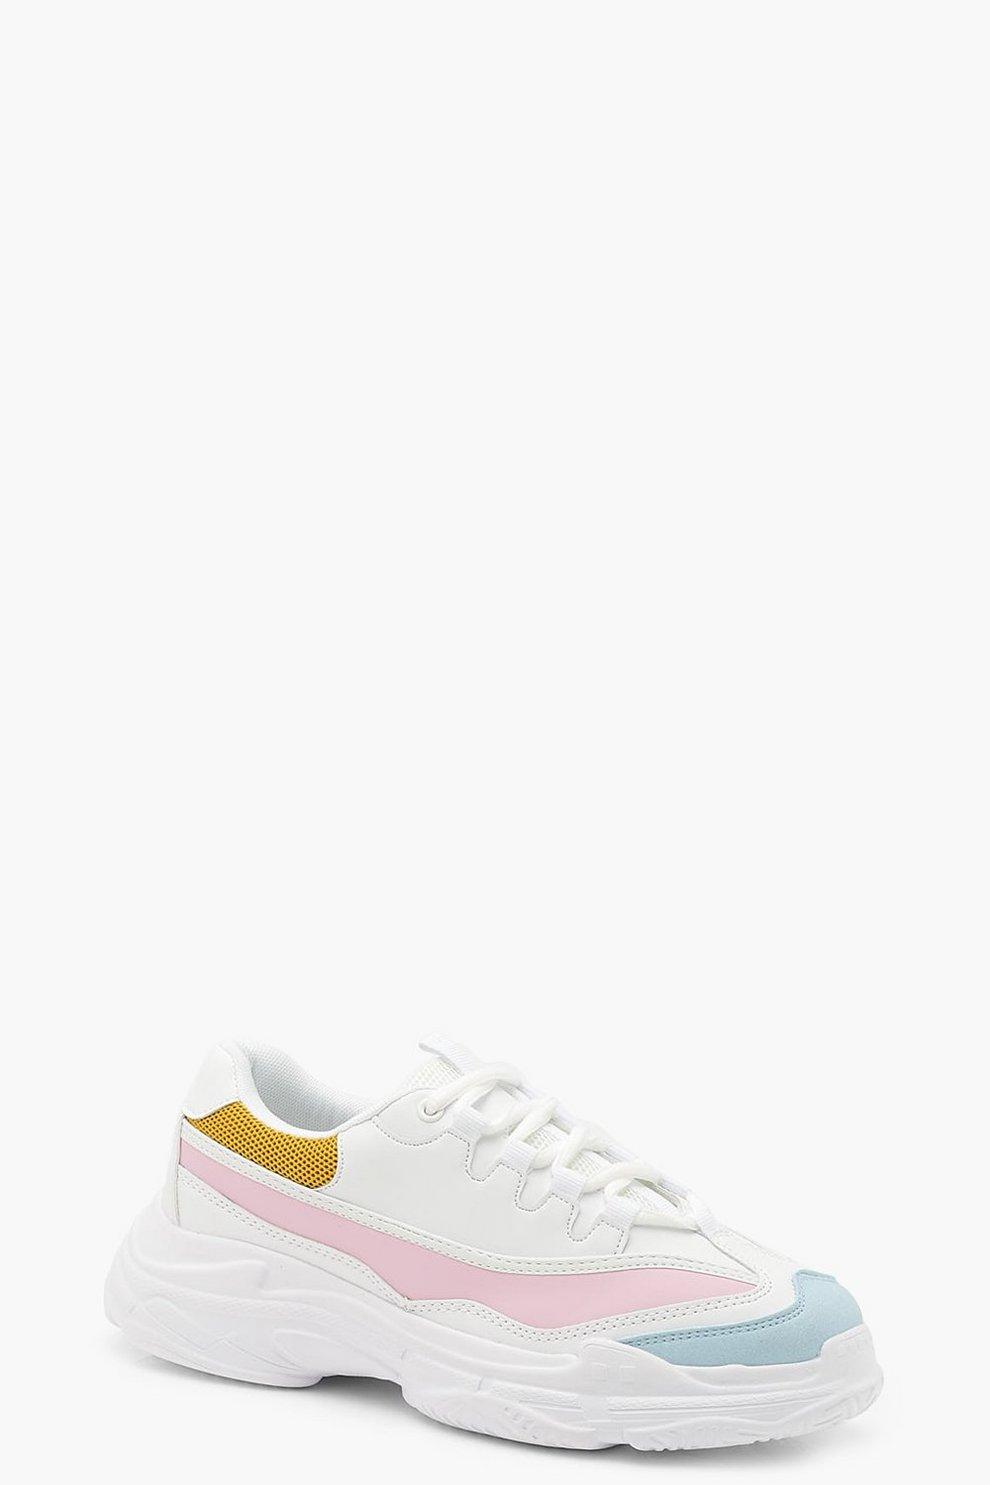 huge selection of f0eda f15fe Colorblock-Sneaker mit dicker Sohle   Boohoo